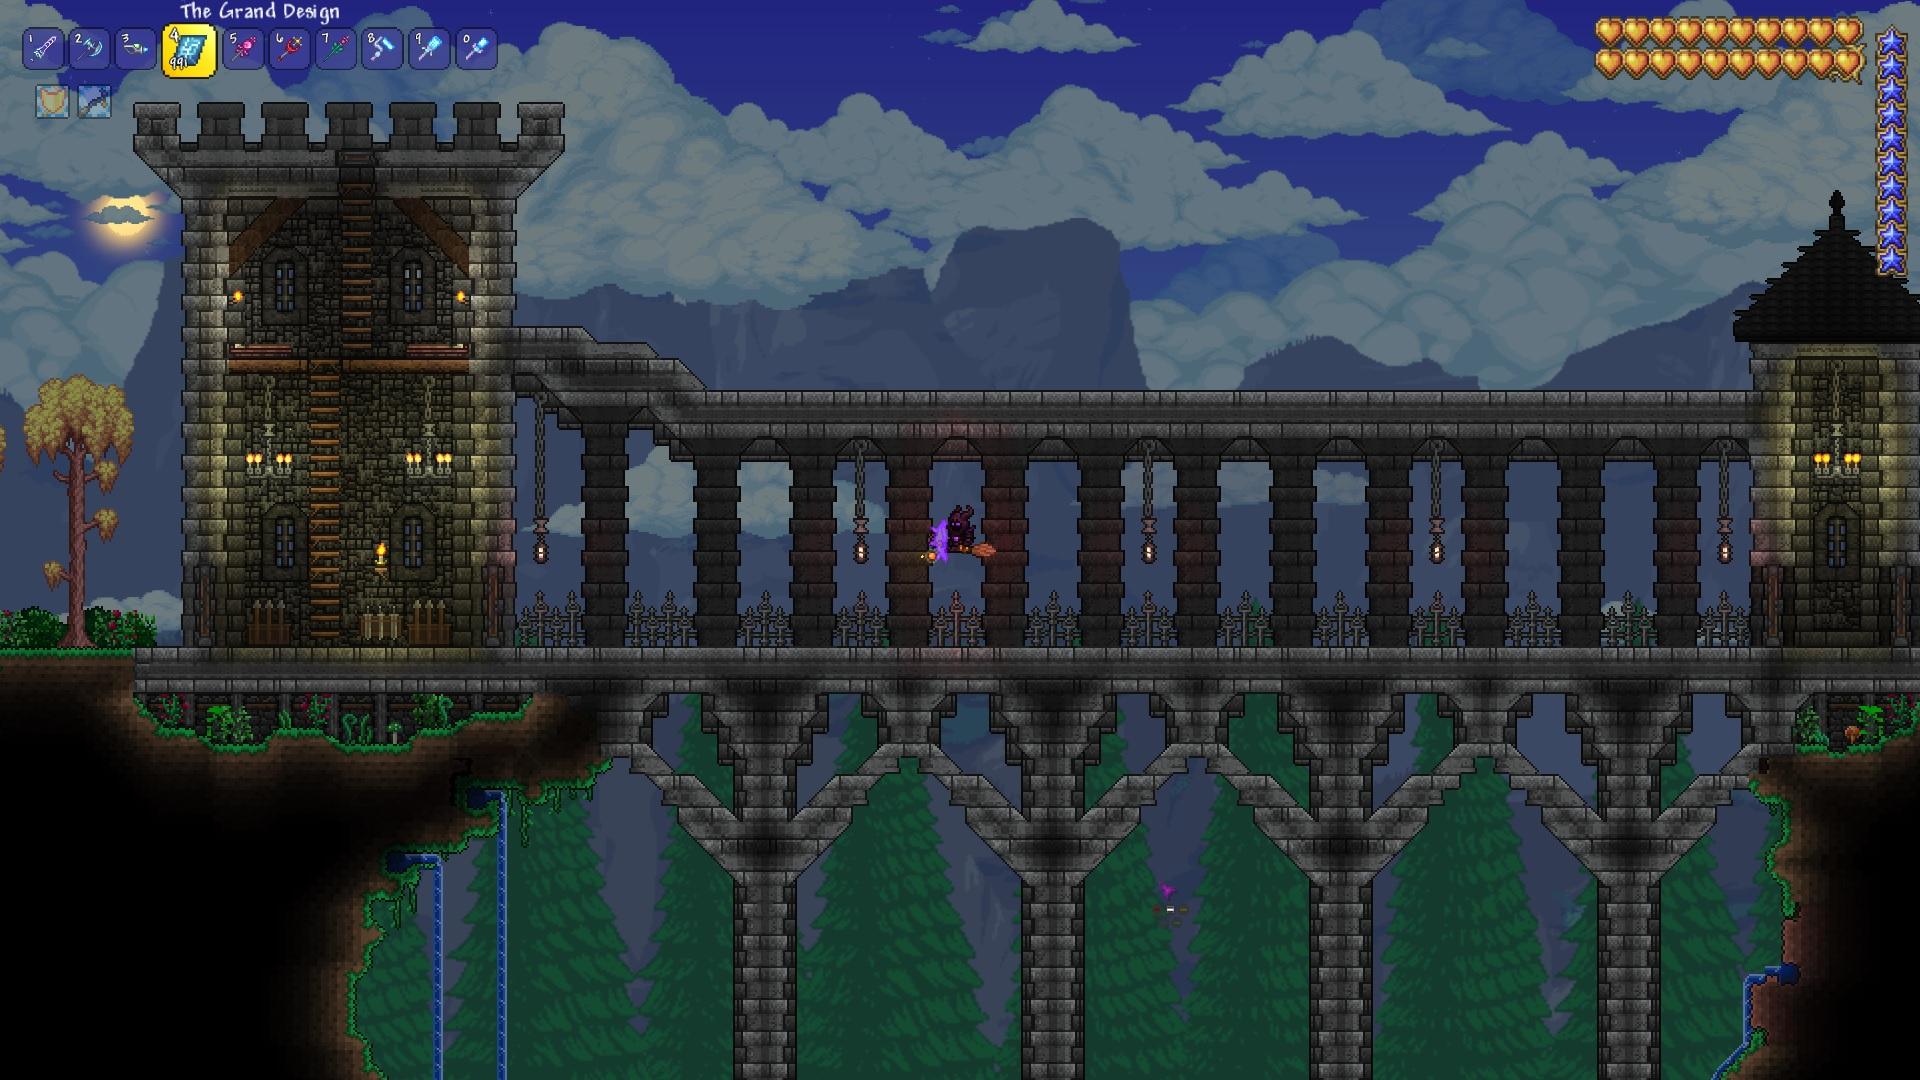 castle bridge + gate tower.jpg